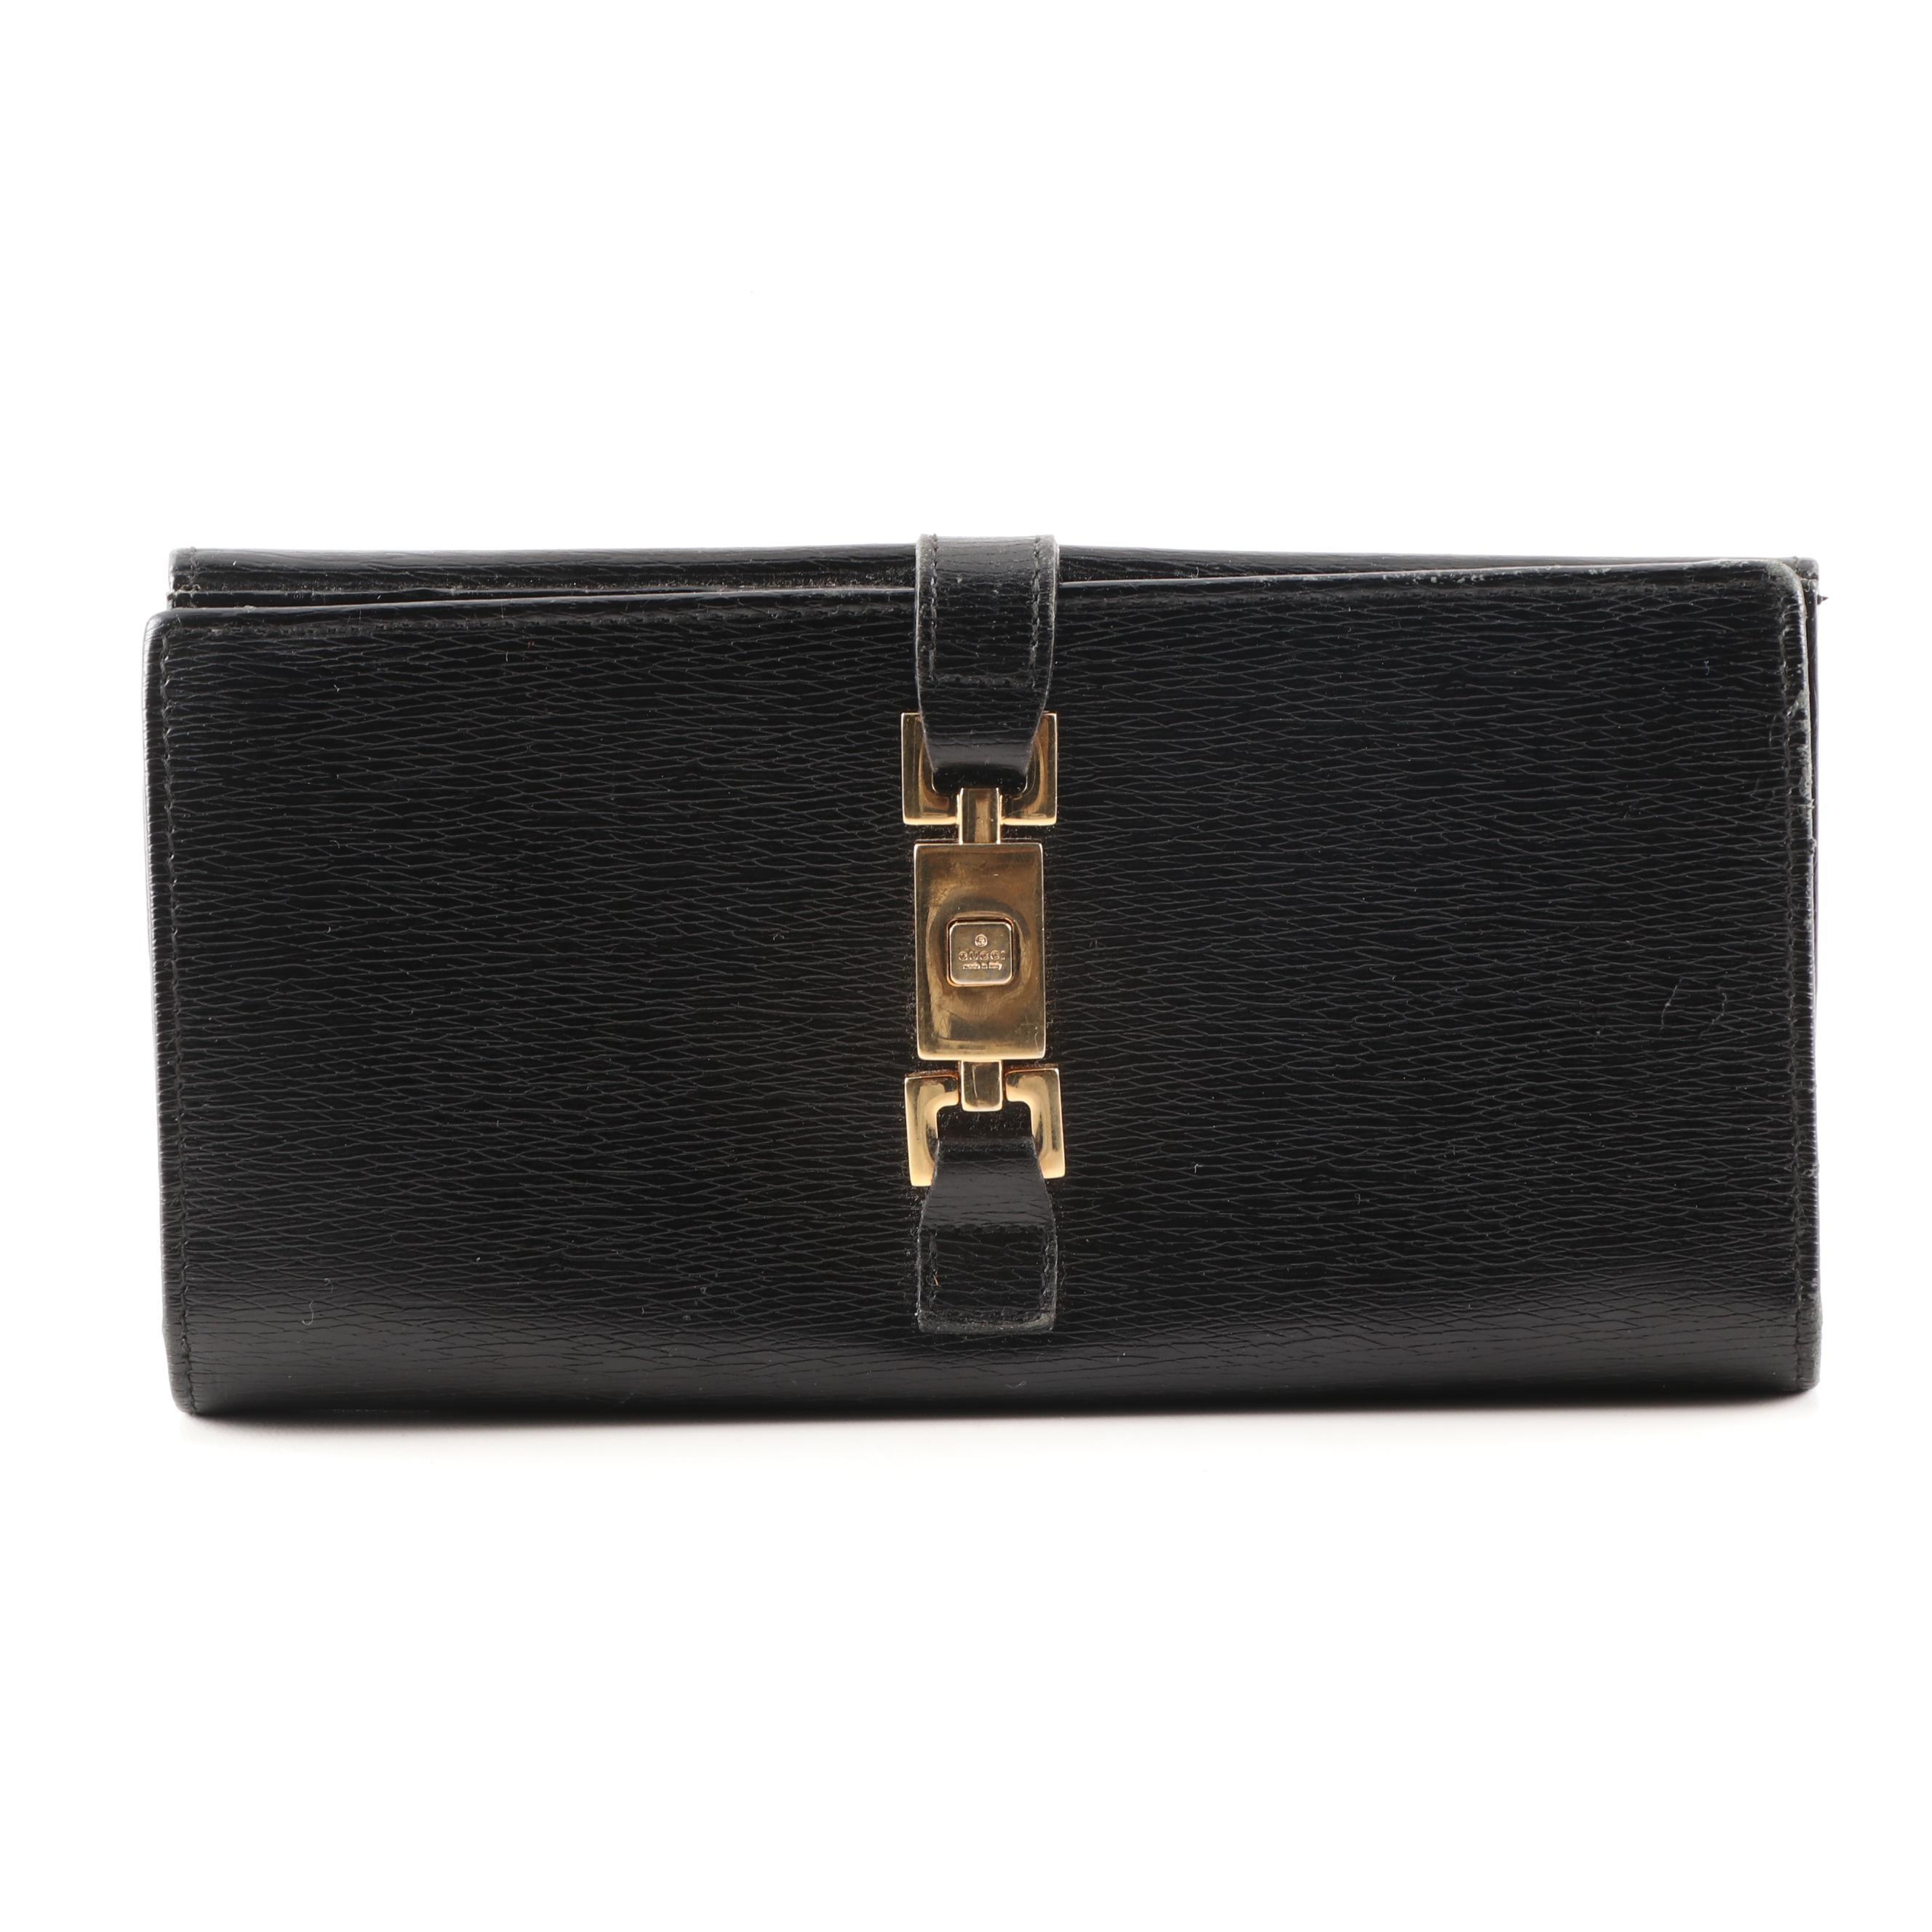 Gucci Piston Lock Black Textured Leather Wallet